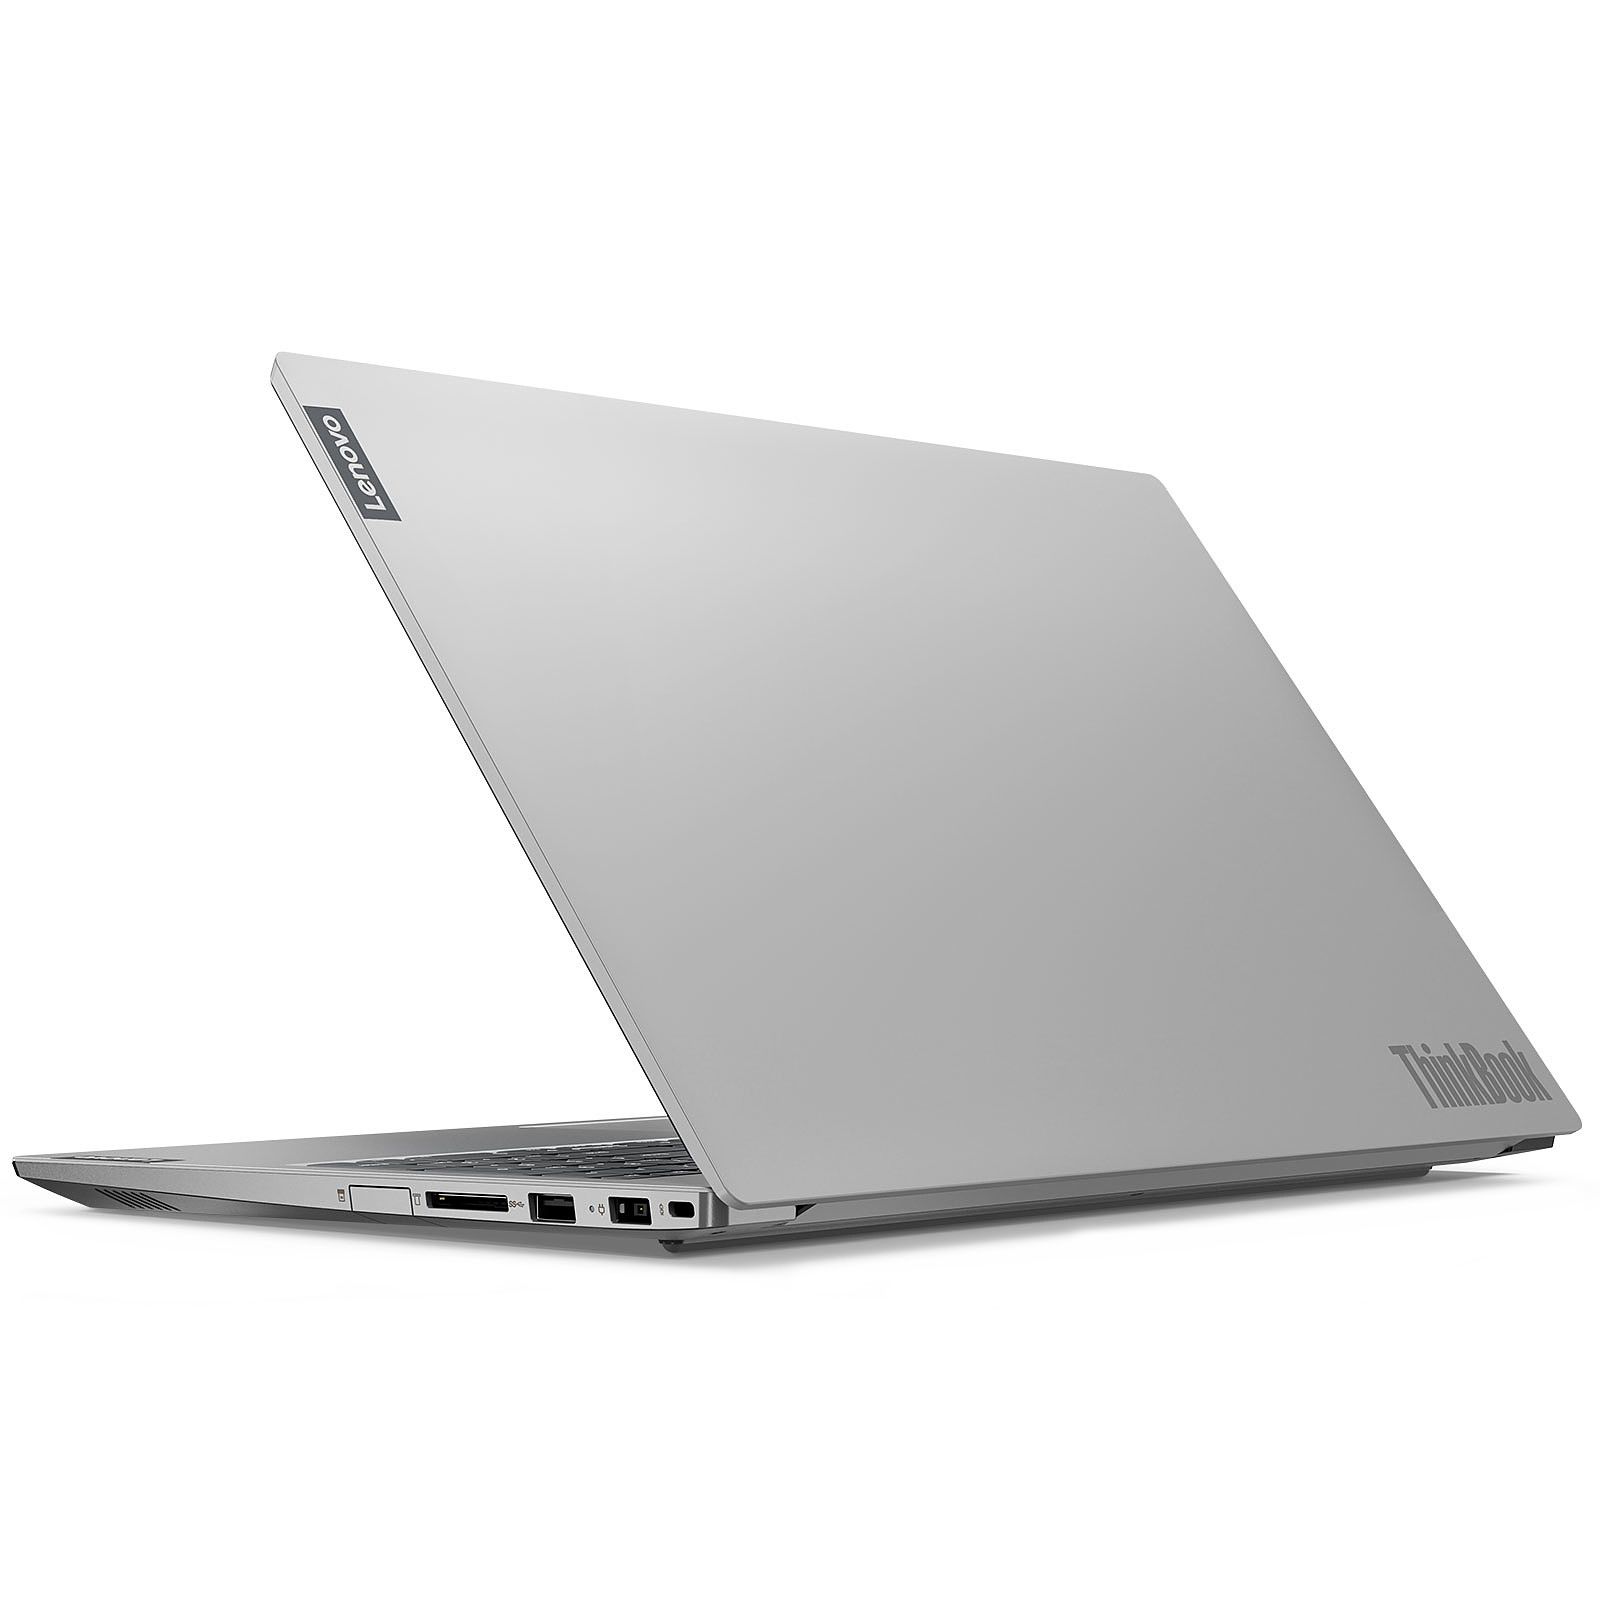 Lenovo 20SM002PFR - PC portable Lenovo - Cybertek.fr - 1